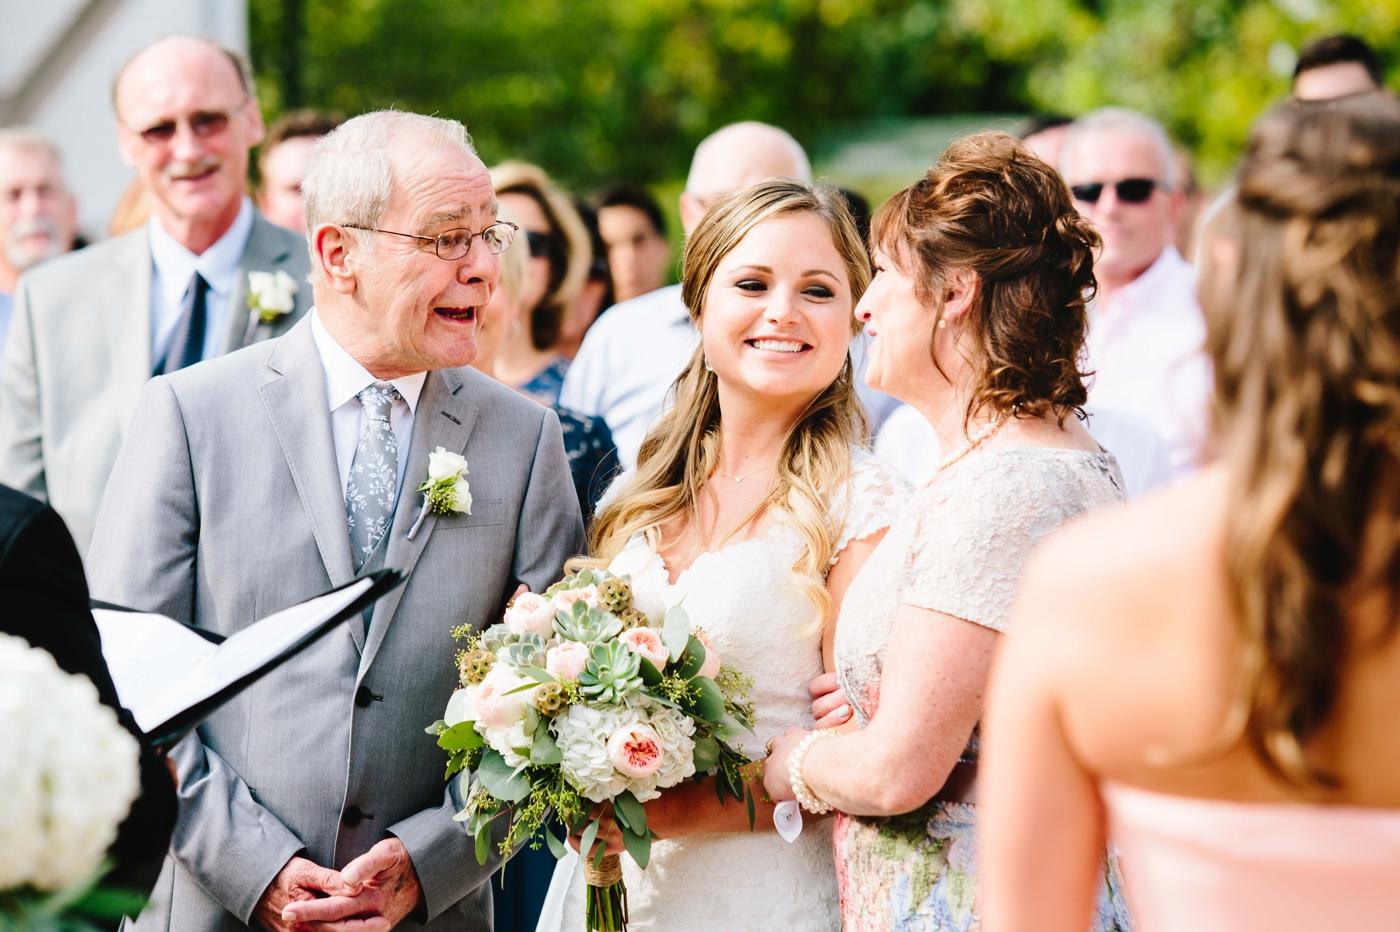 chicago-fine-art-wedding-photography-chiapetta24